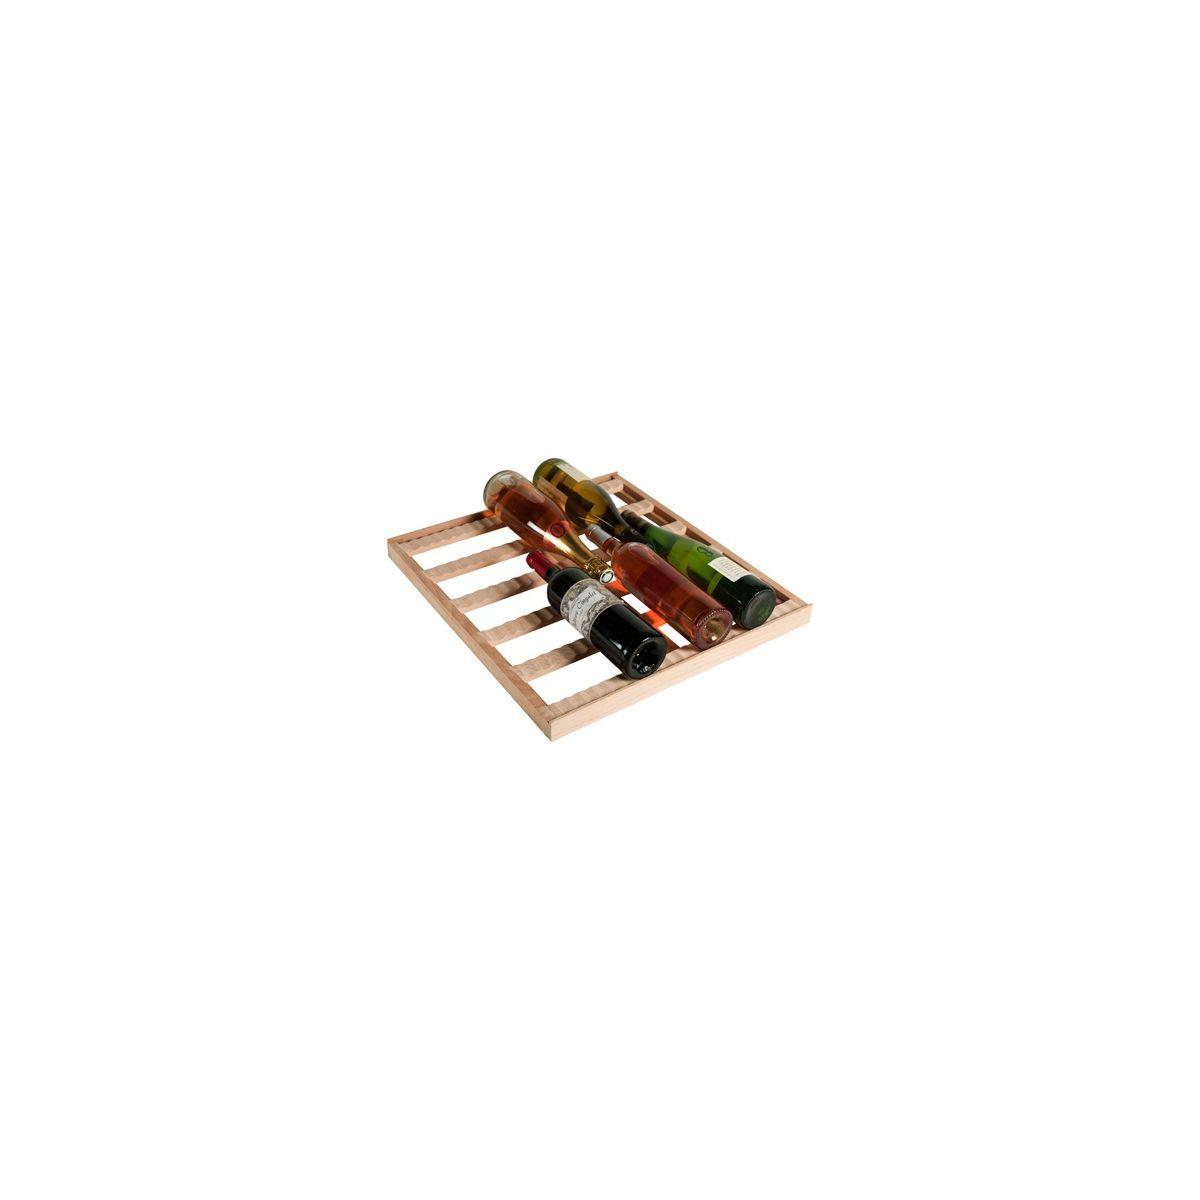 Clayette la sommeliere clayette clatrad06 - livraison offerte : code livd (photo)